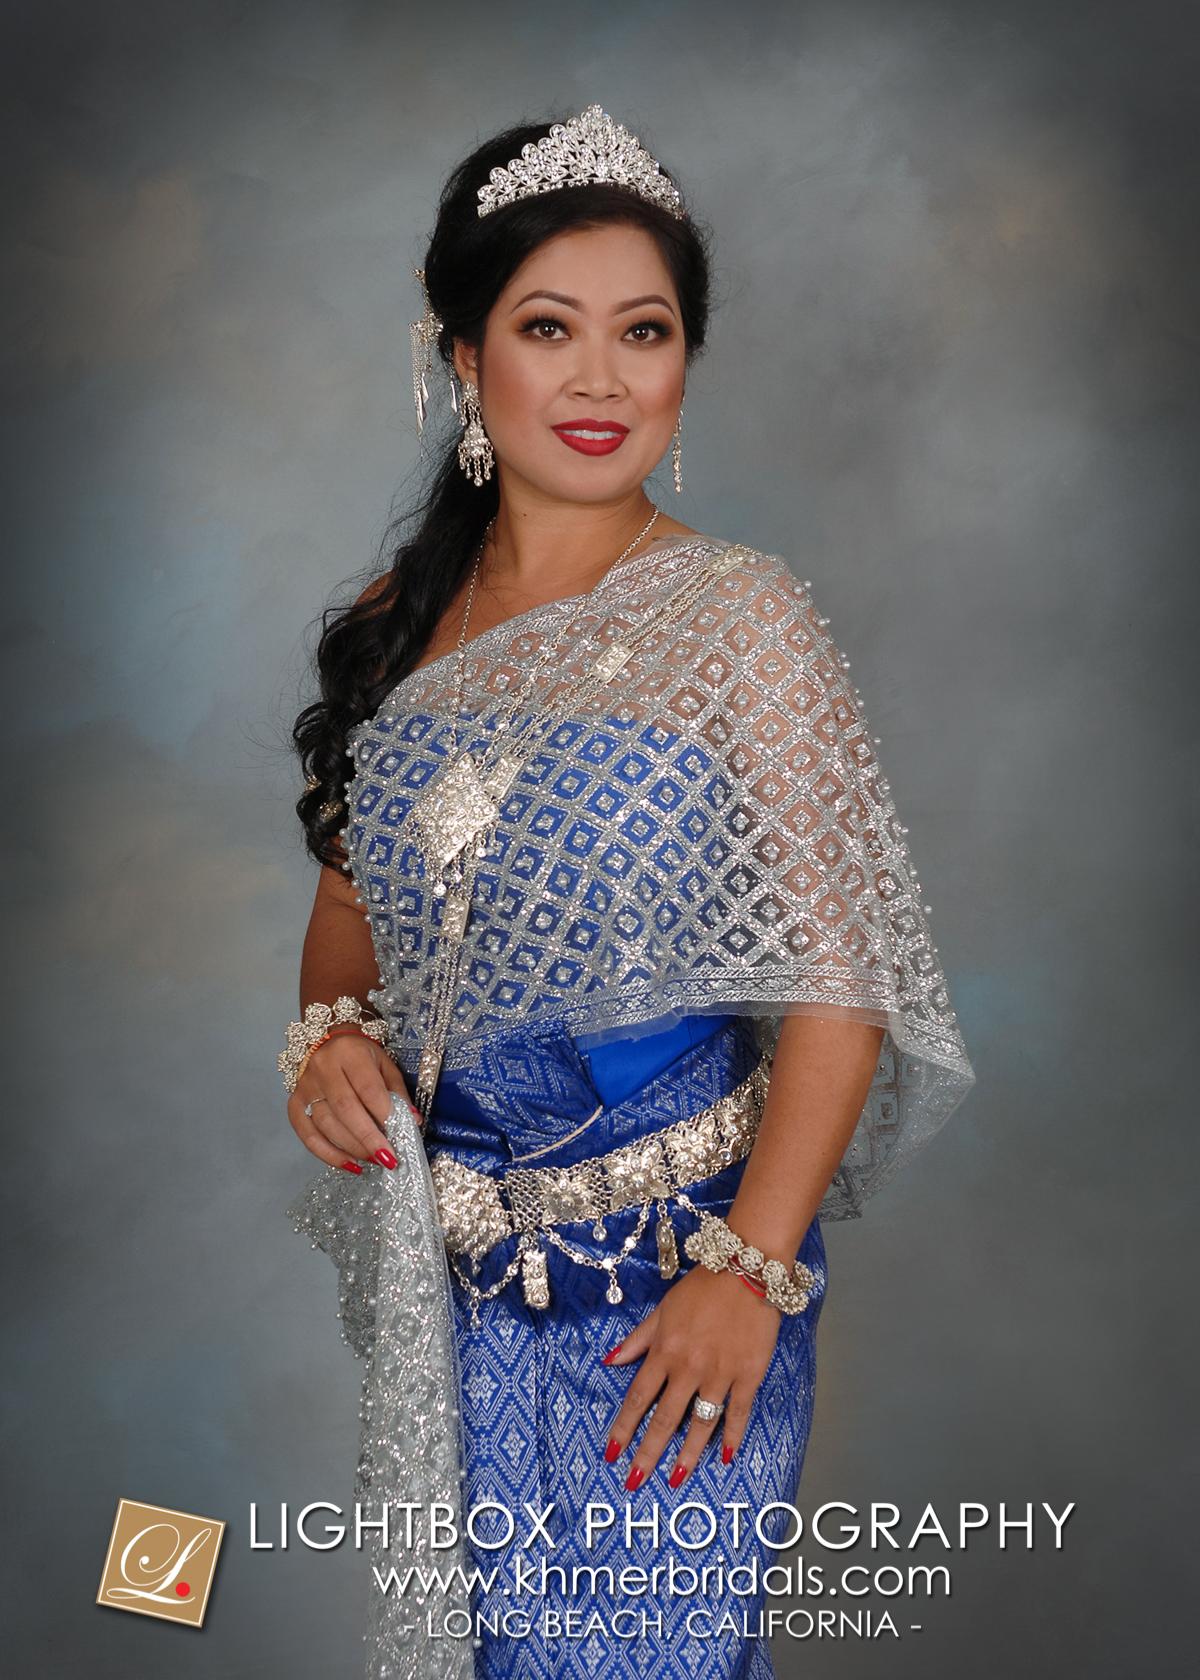 Apsara Khmer Bridal Wedding Photography and video-206.jpg